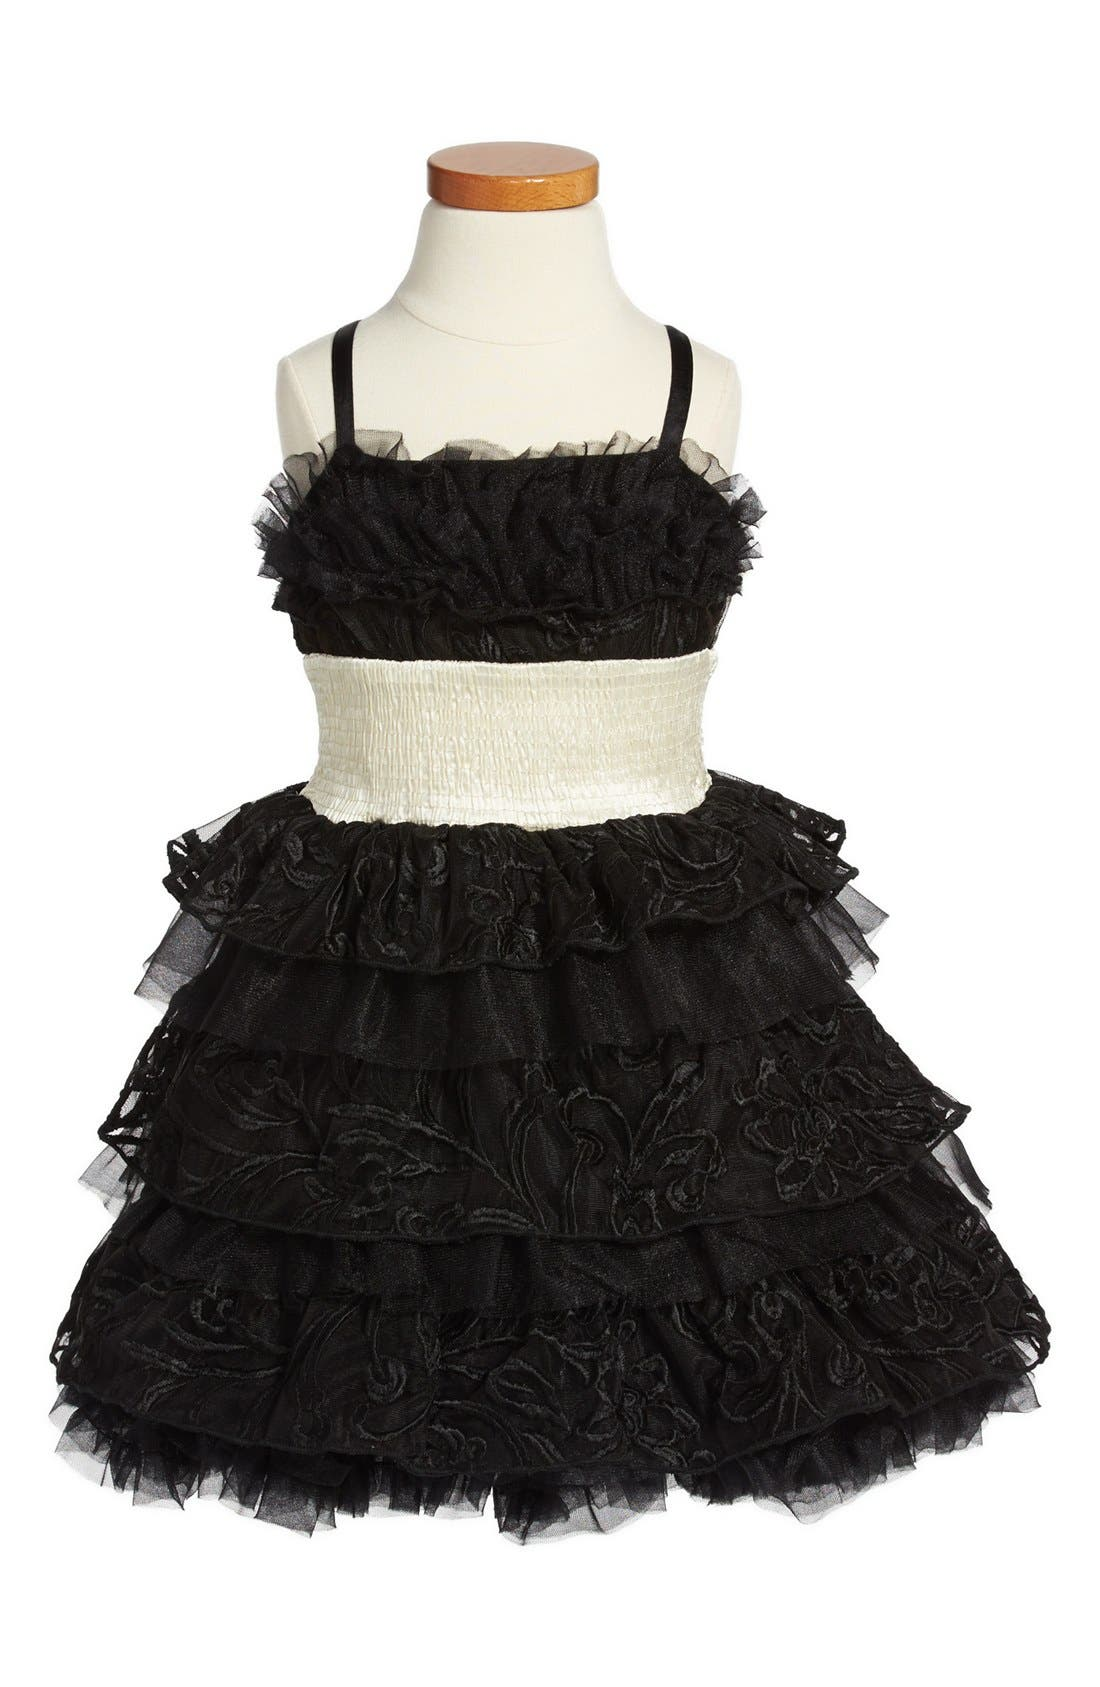 Alternate Image 1 Selected - Ooh! La, La! Couture 'Wow - Cake' Dress (Little Girls & Big Girls)